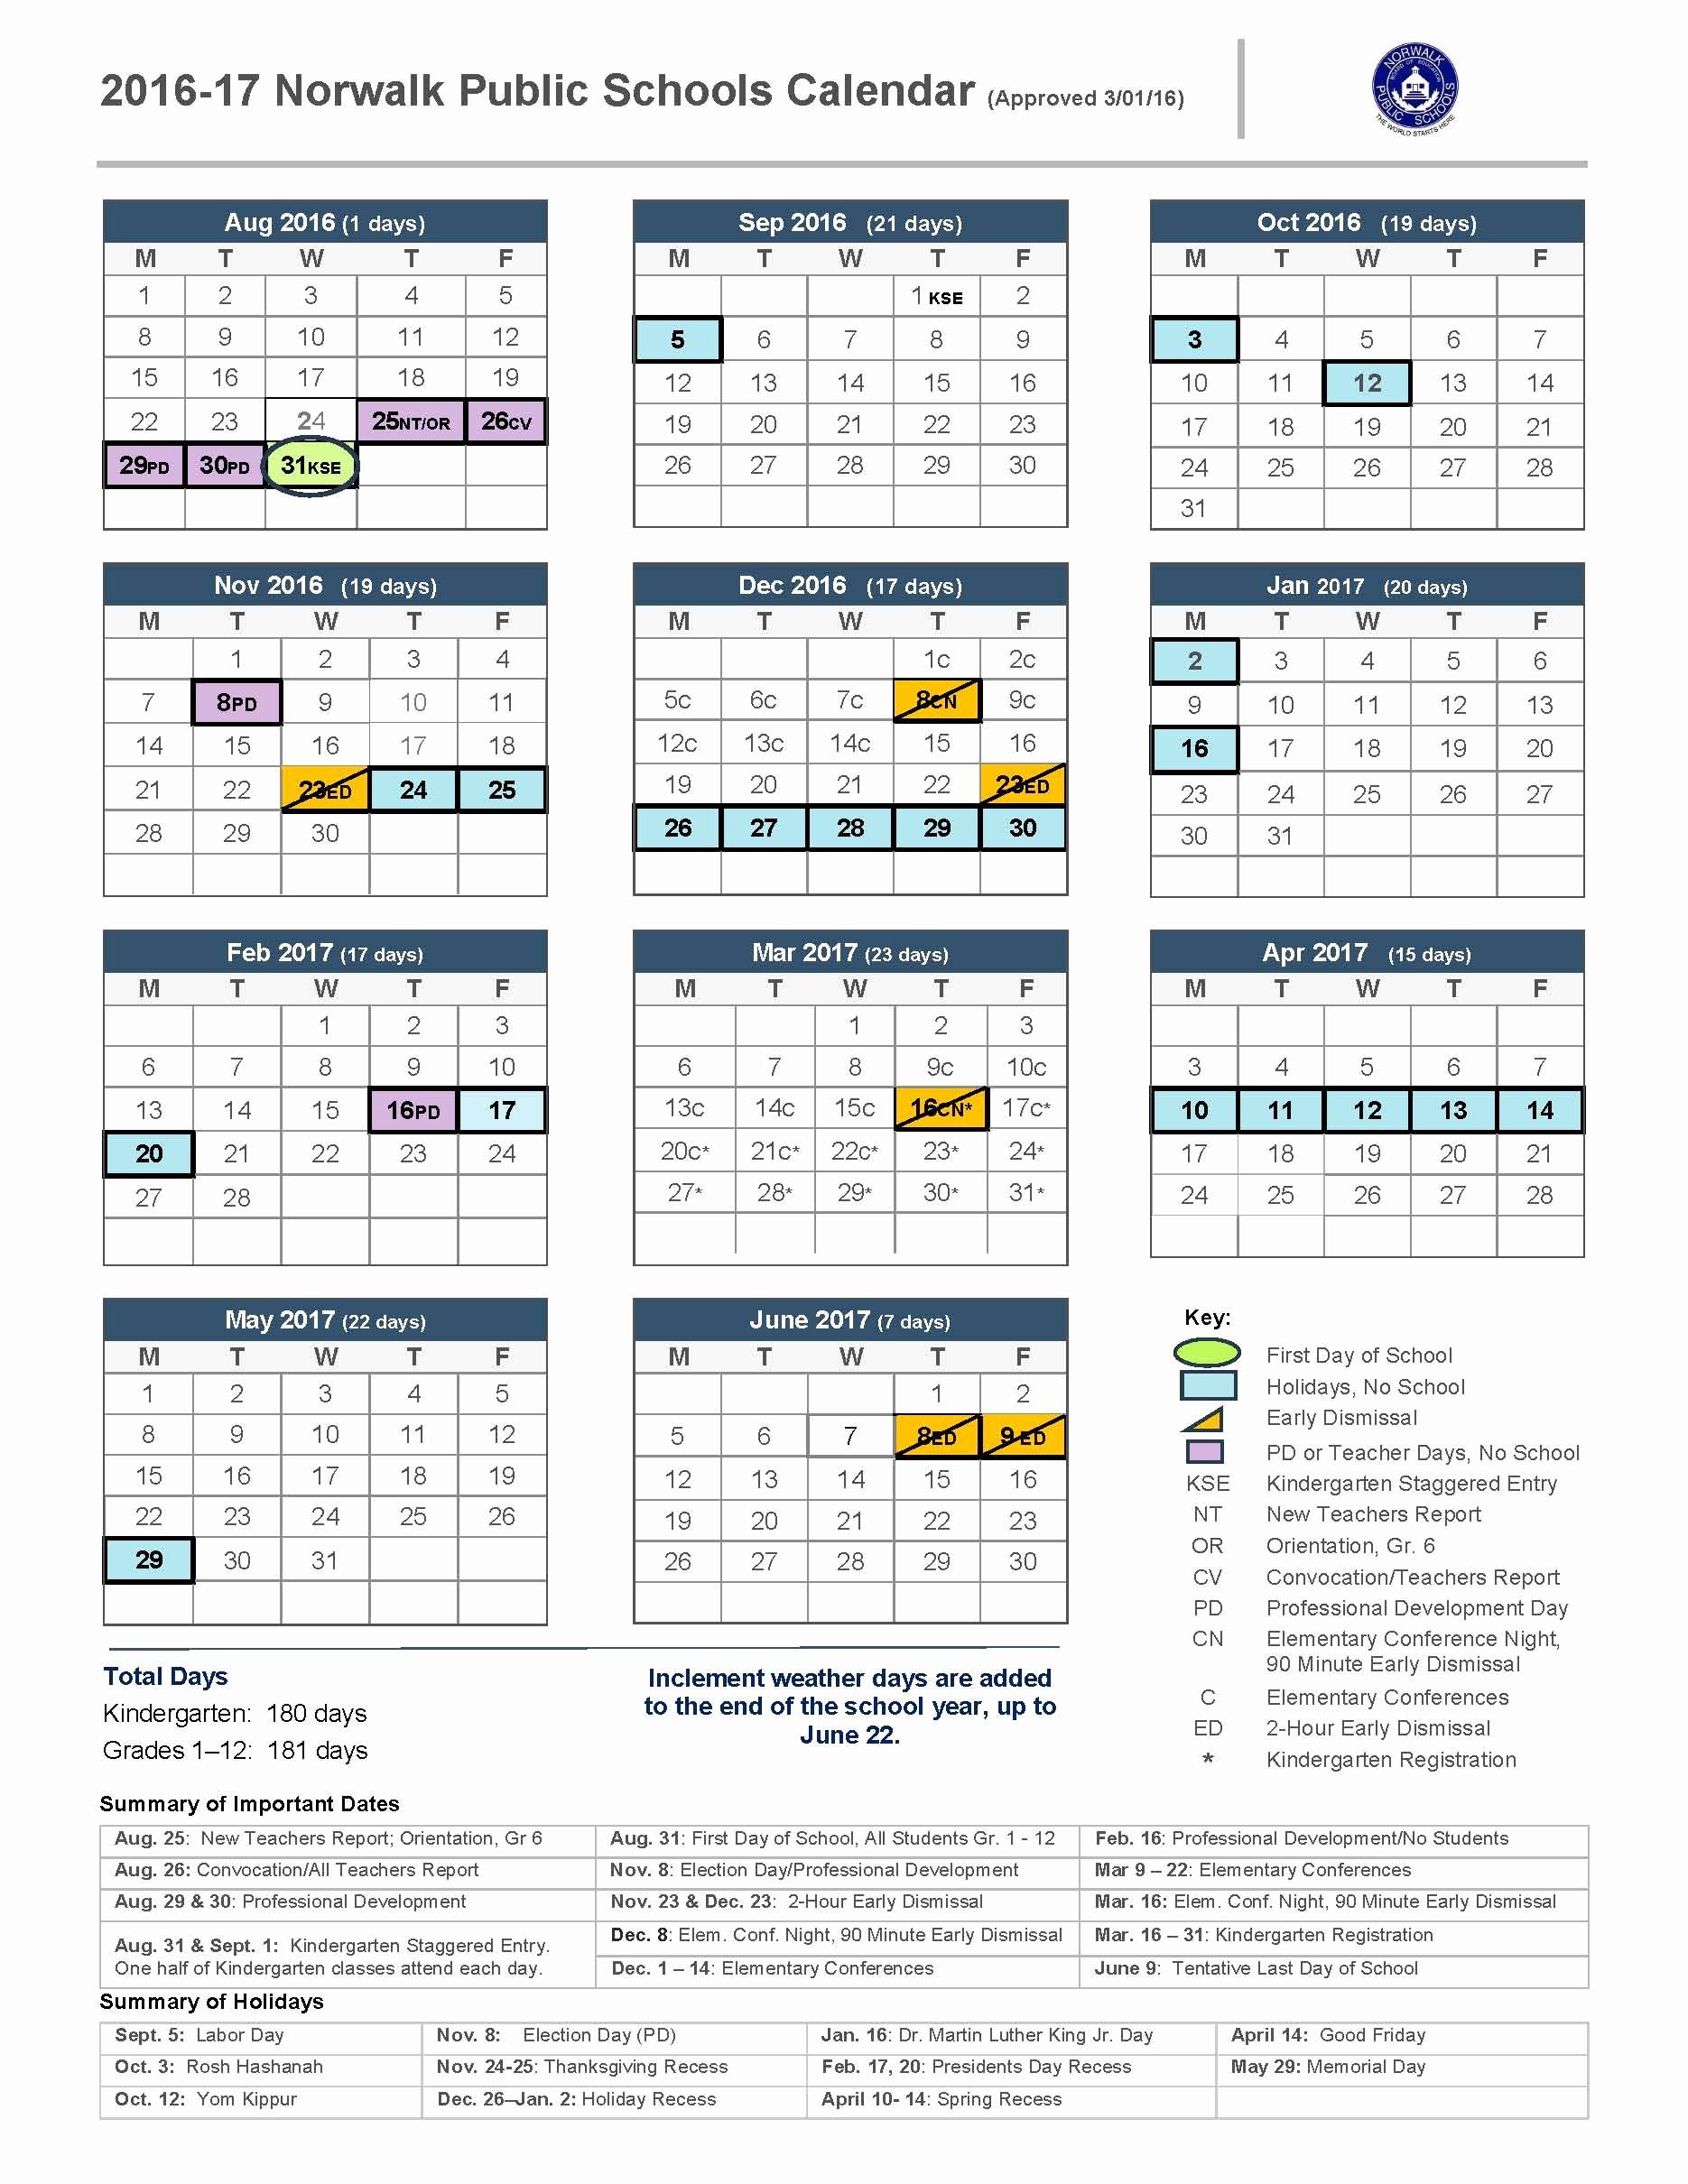 Blank Calendar 2016-17 New 2016 17 School Calendar norwalk Public Schools